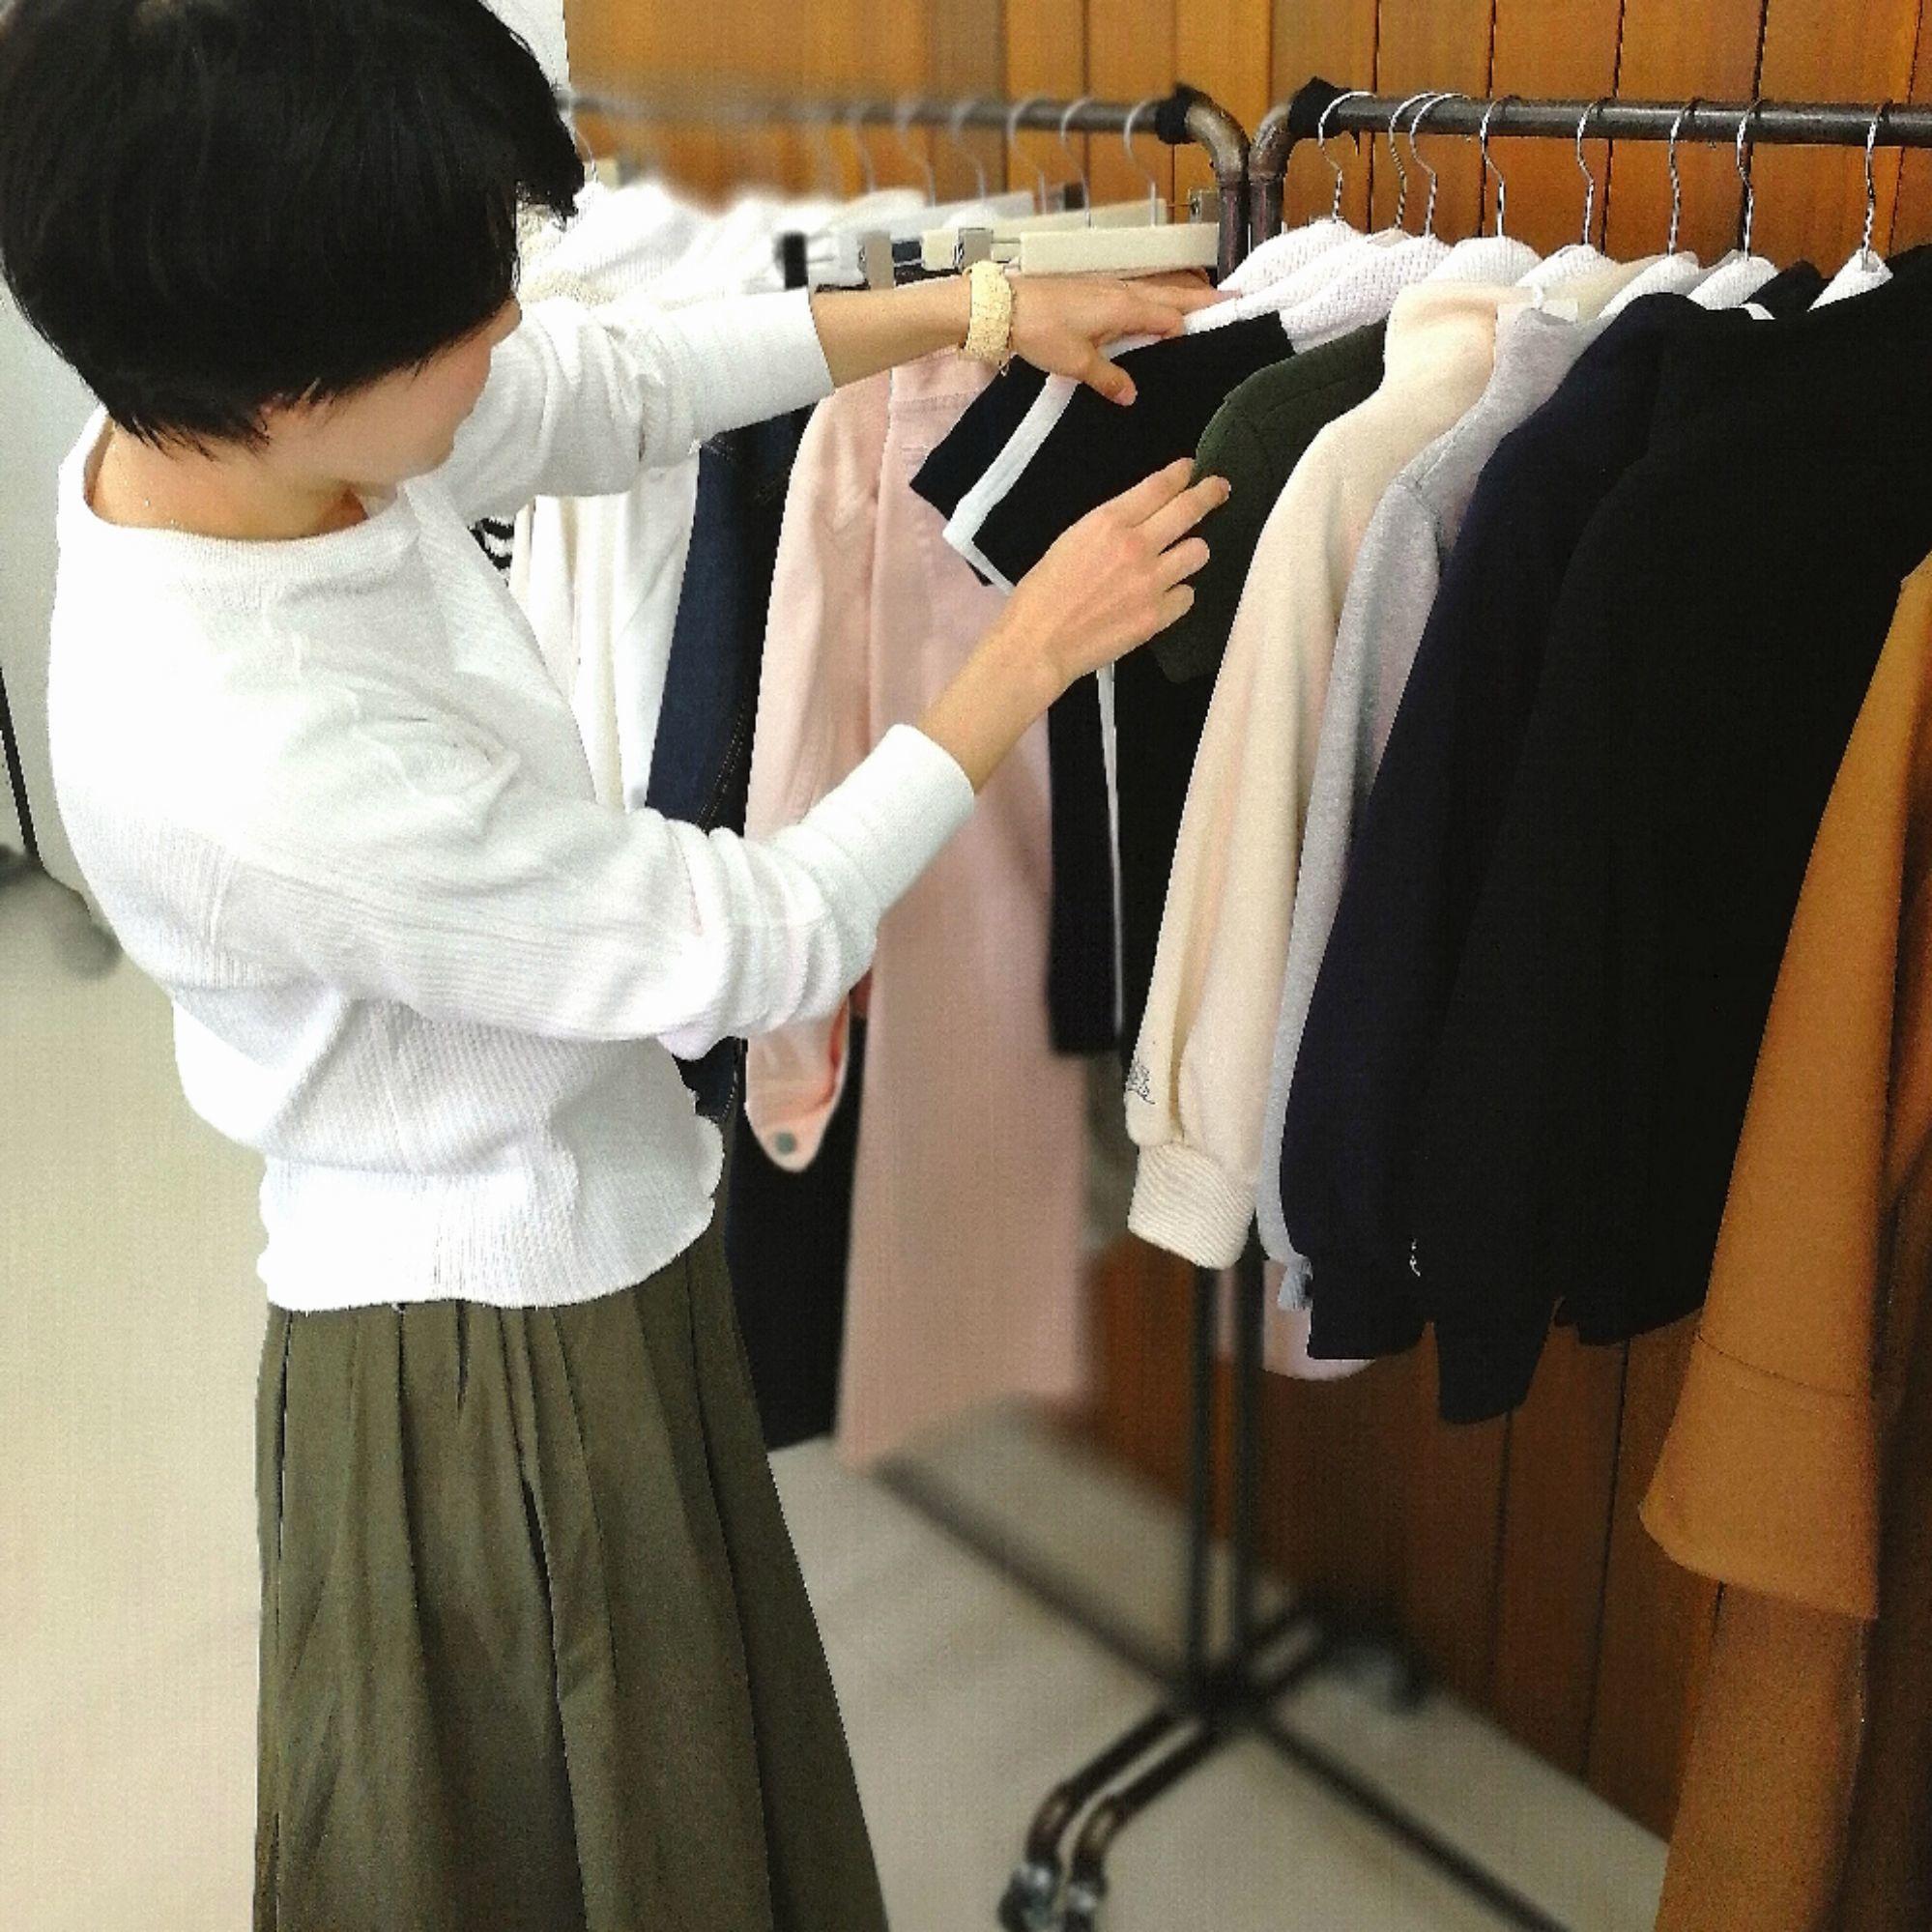 Marisol誌面で一目惚れしたスカートを求めて_1_1-3